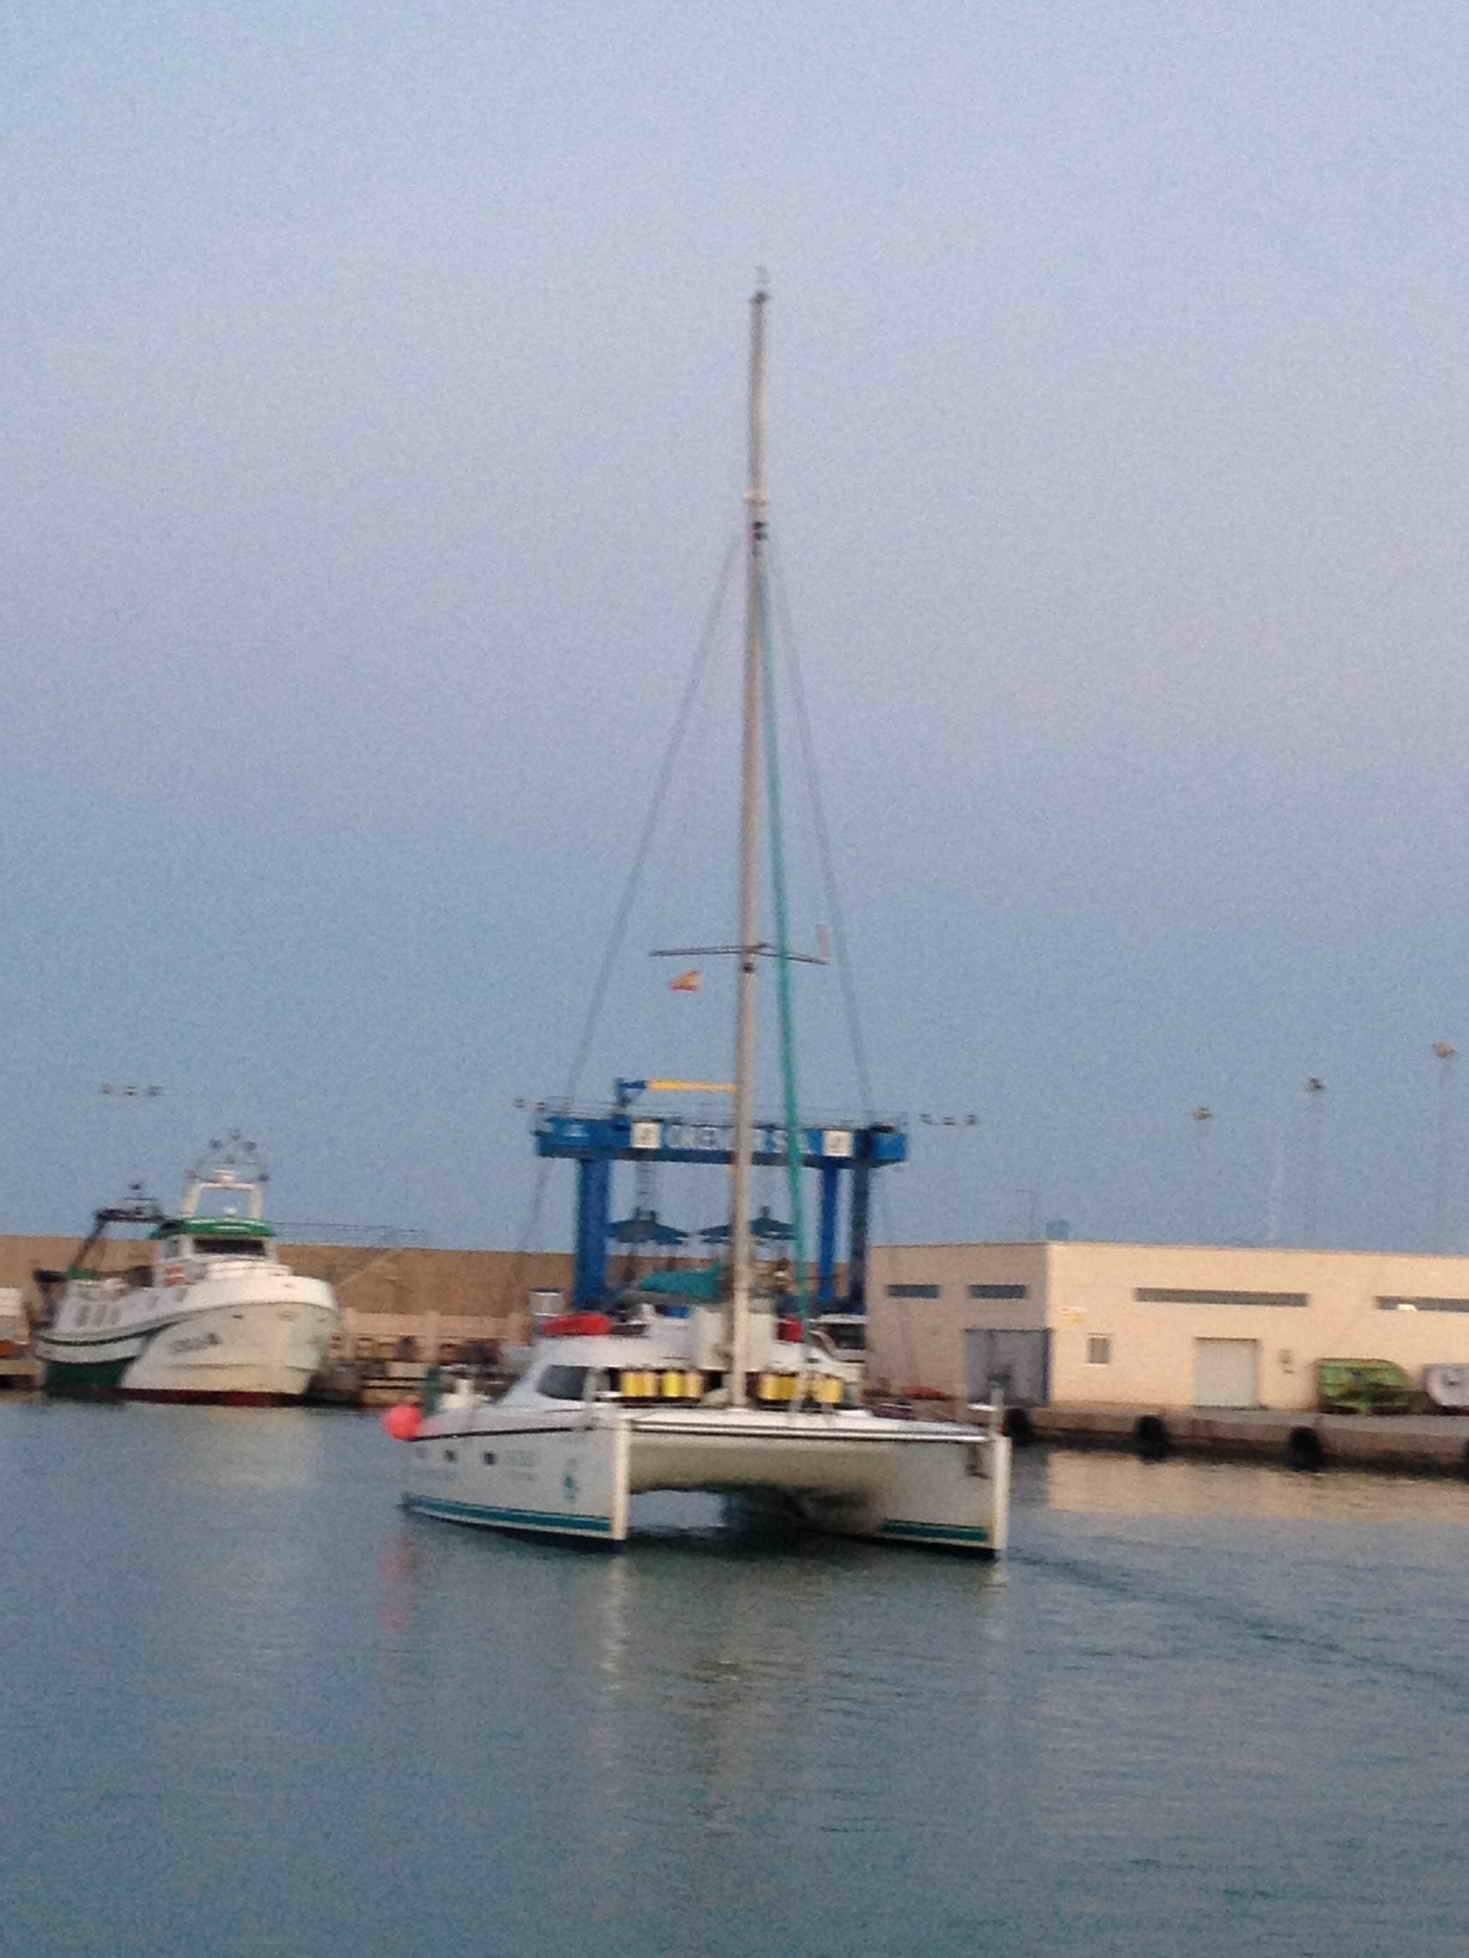 Viaje de buceo fin de semana vida a bordo reserva Islas COLUMBRETES 20-22 septiembre